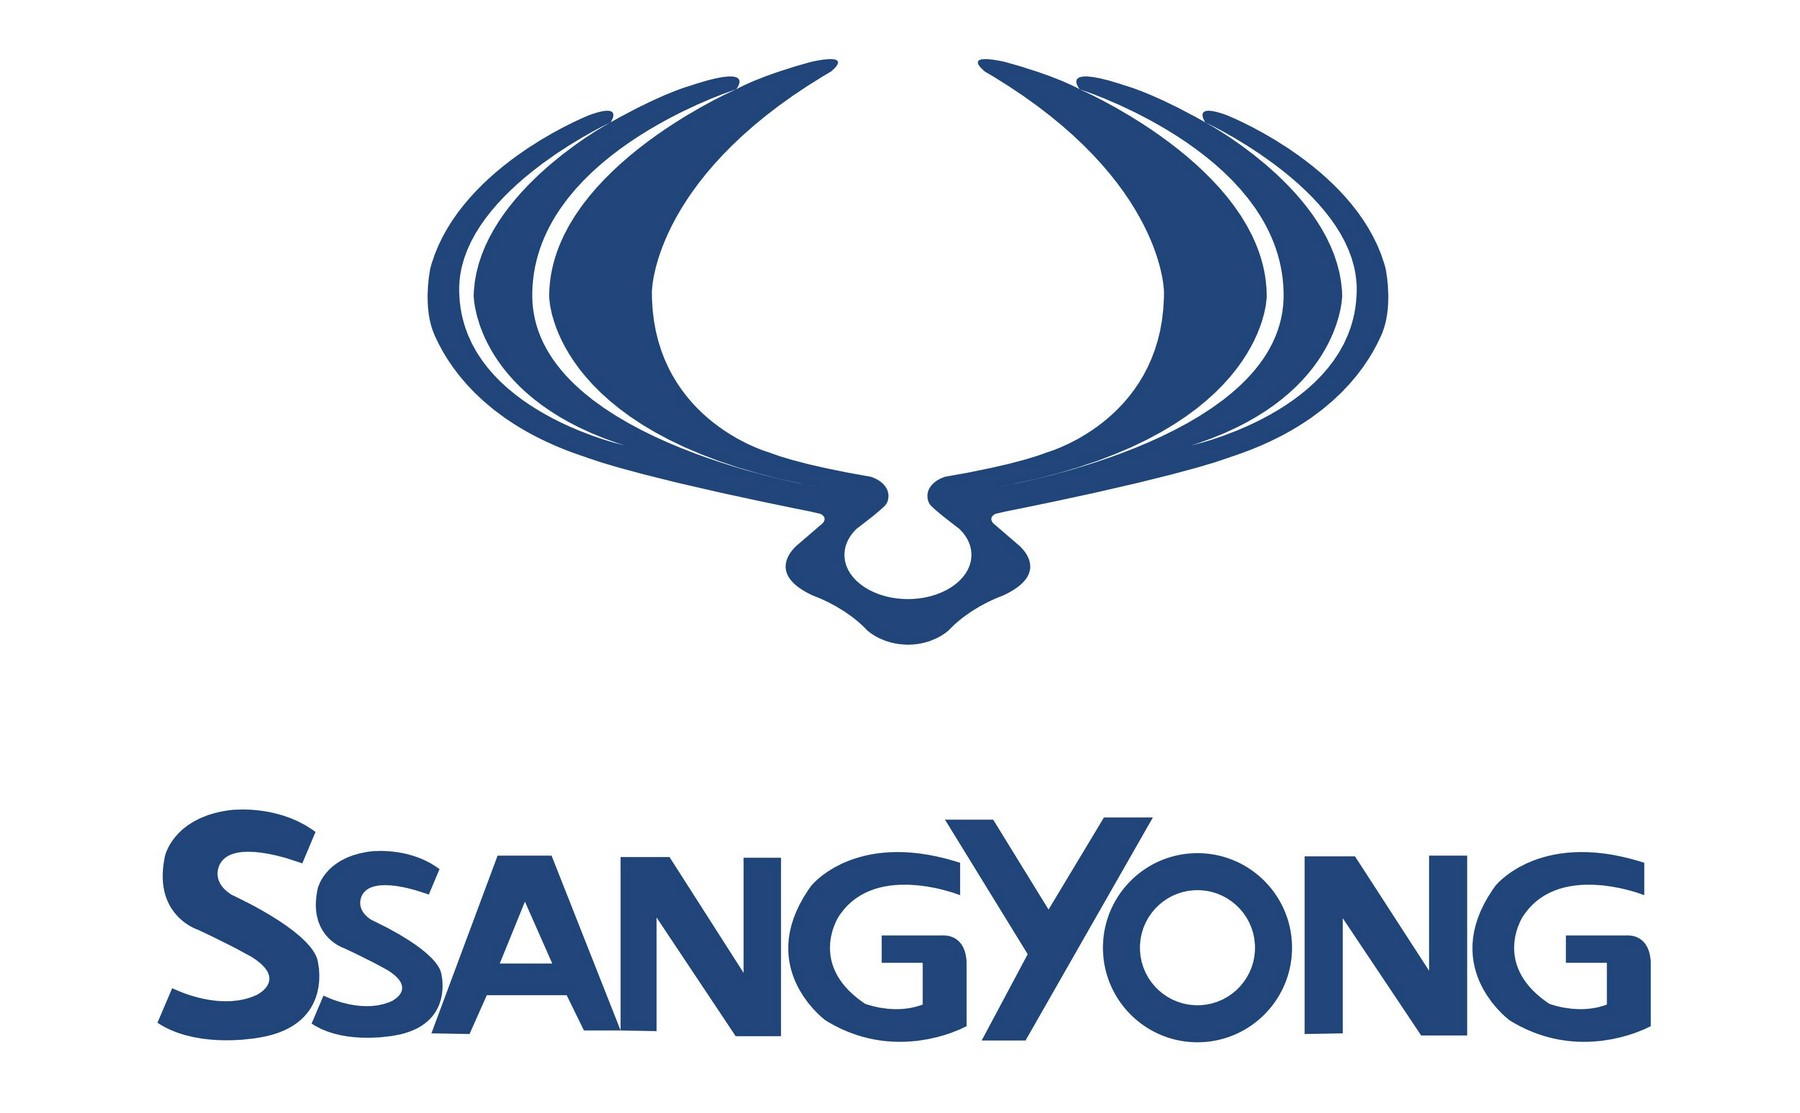 Photo of SsangYong Şubat 2016 Fiyat Listesi